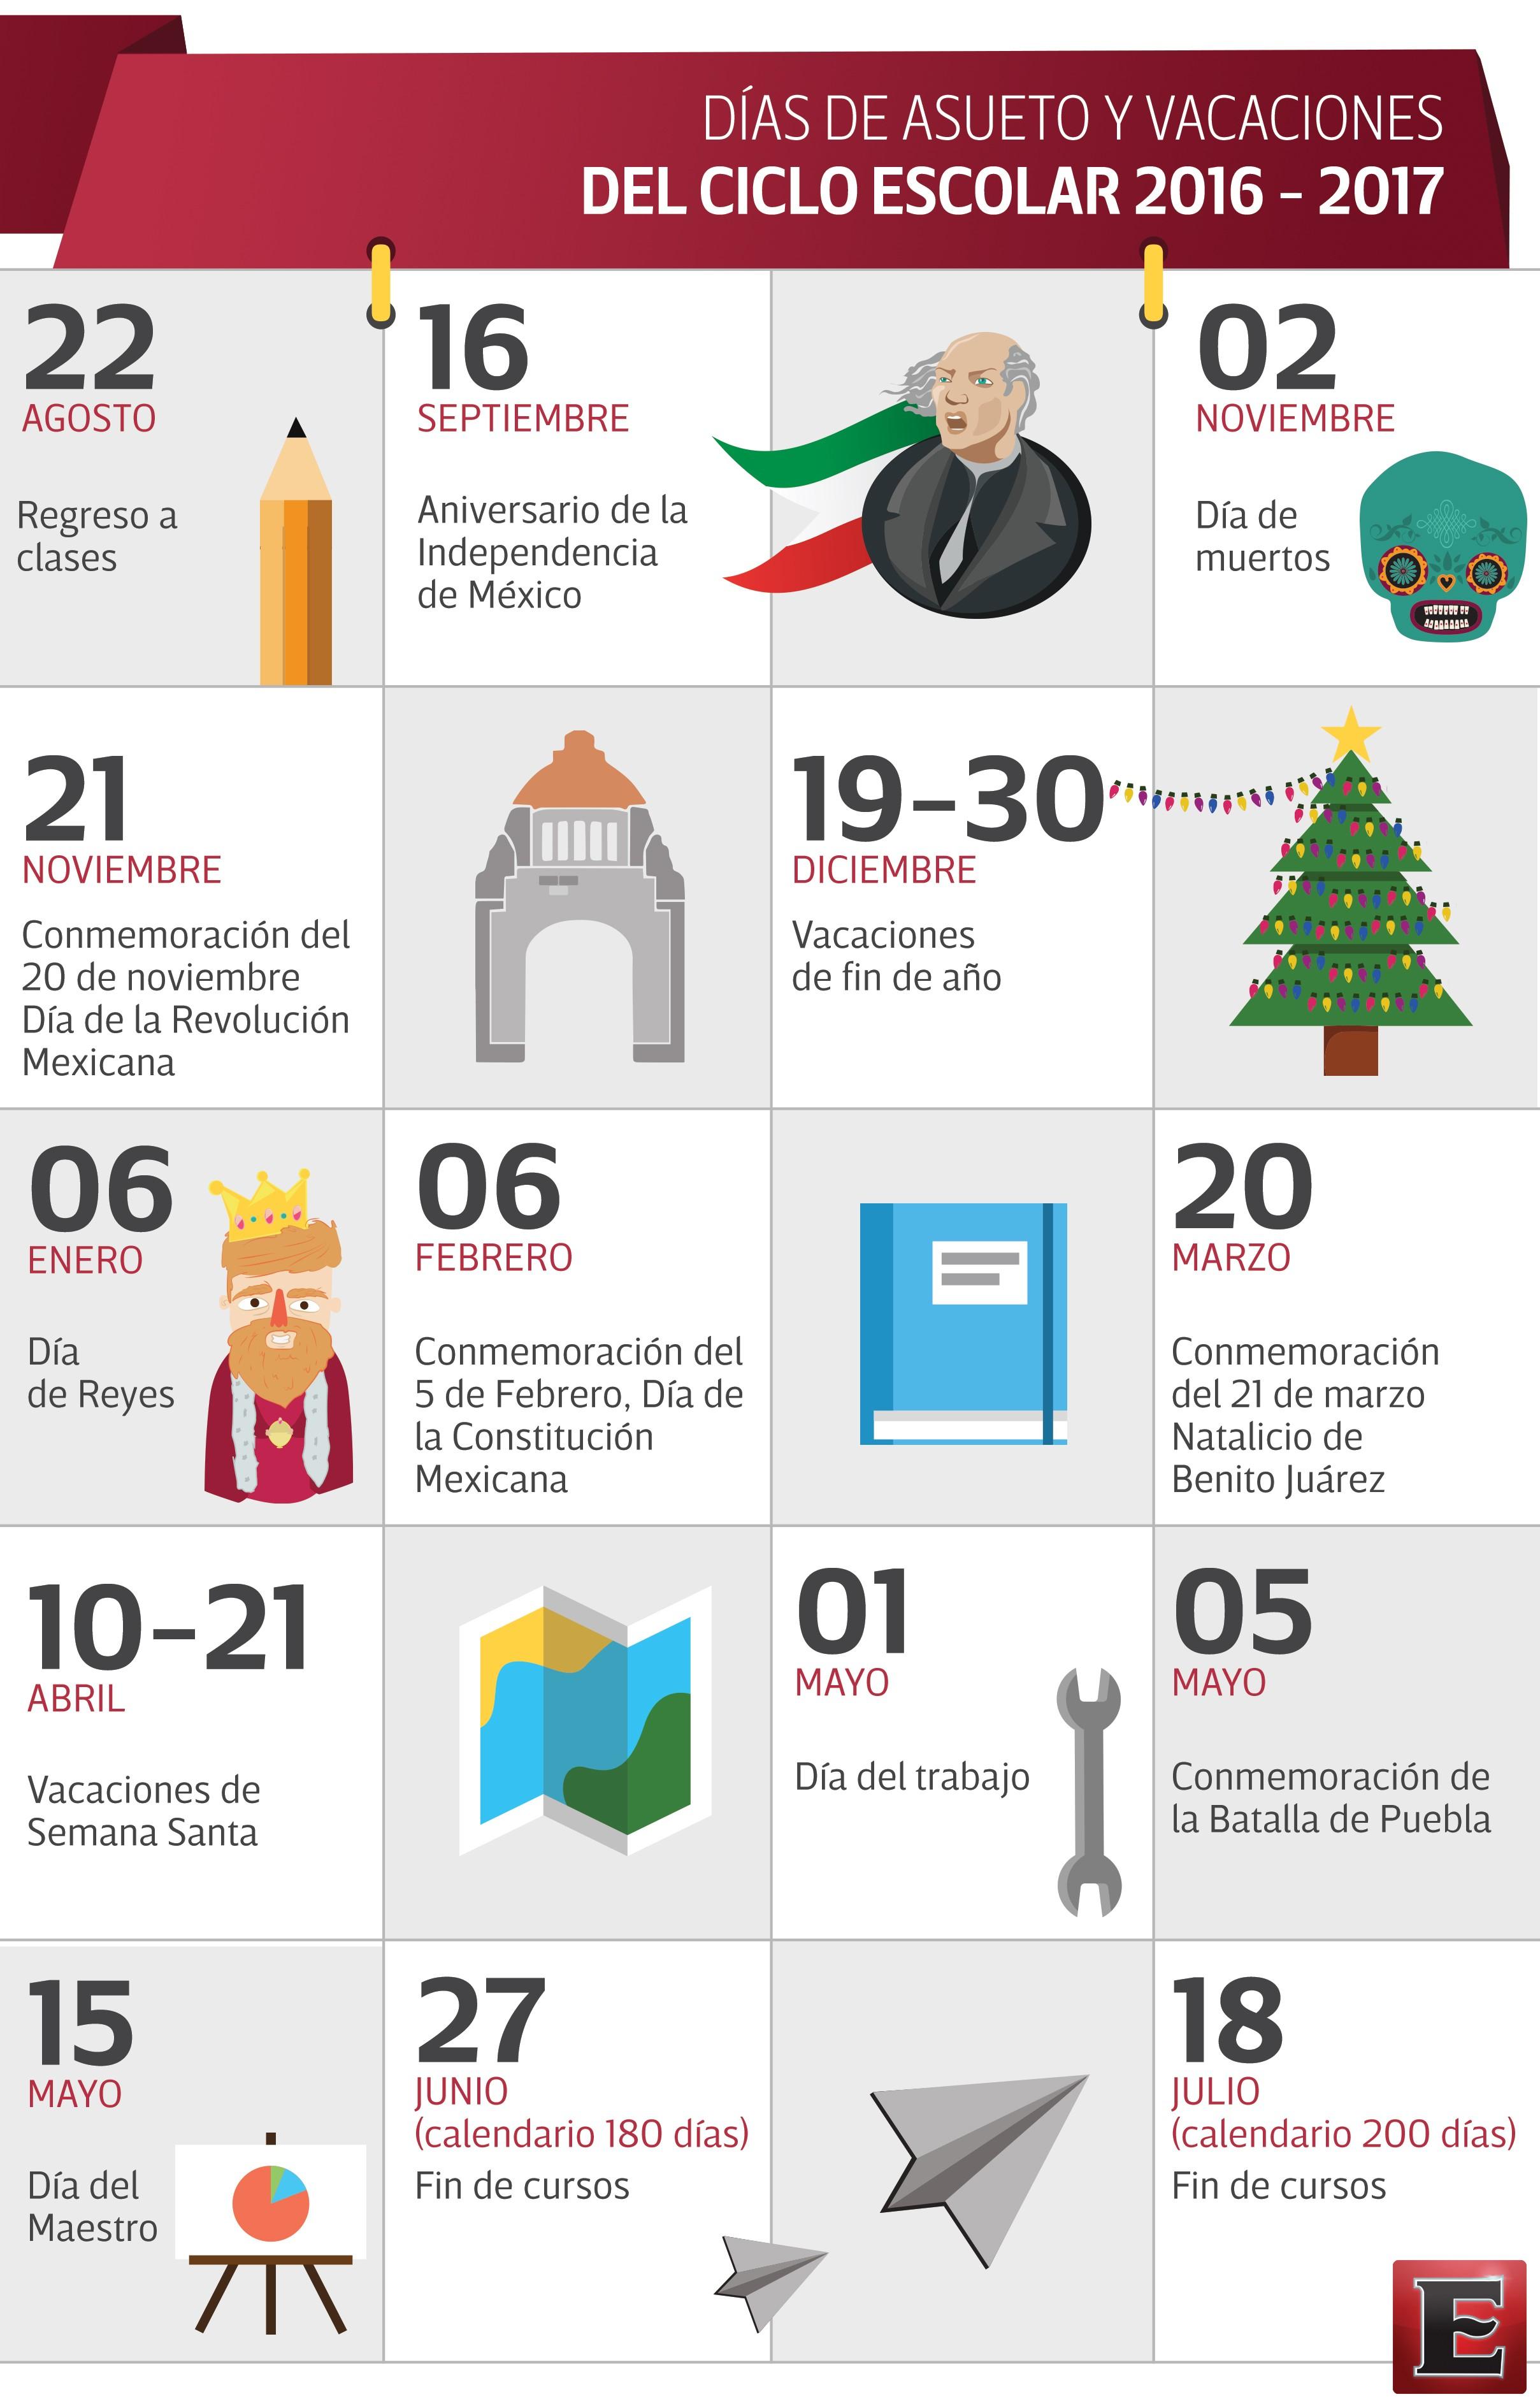 Calendario 2017 Feriados Bahia calendrier